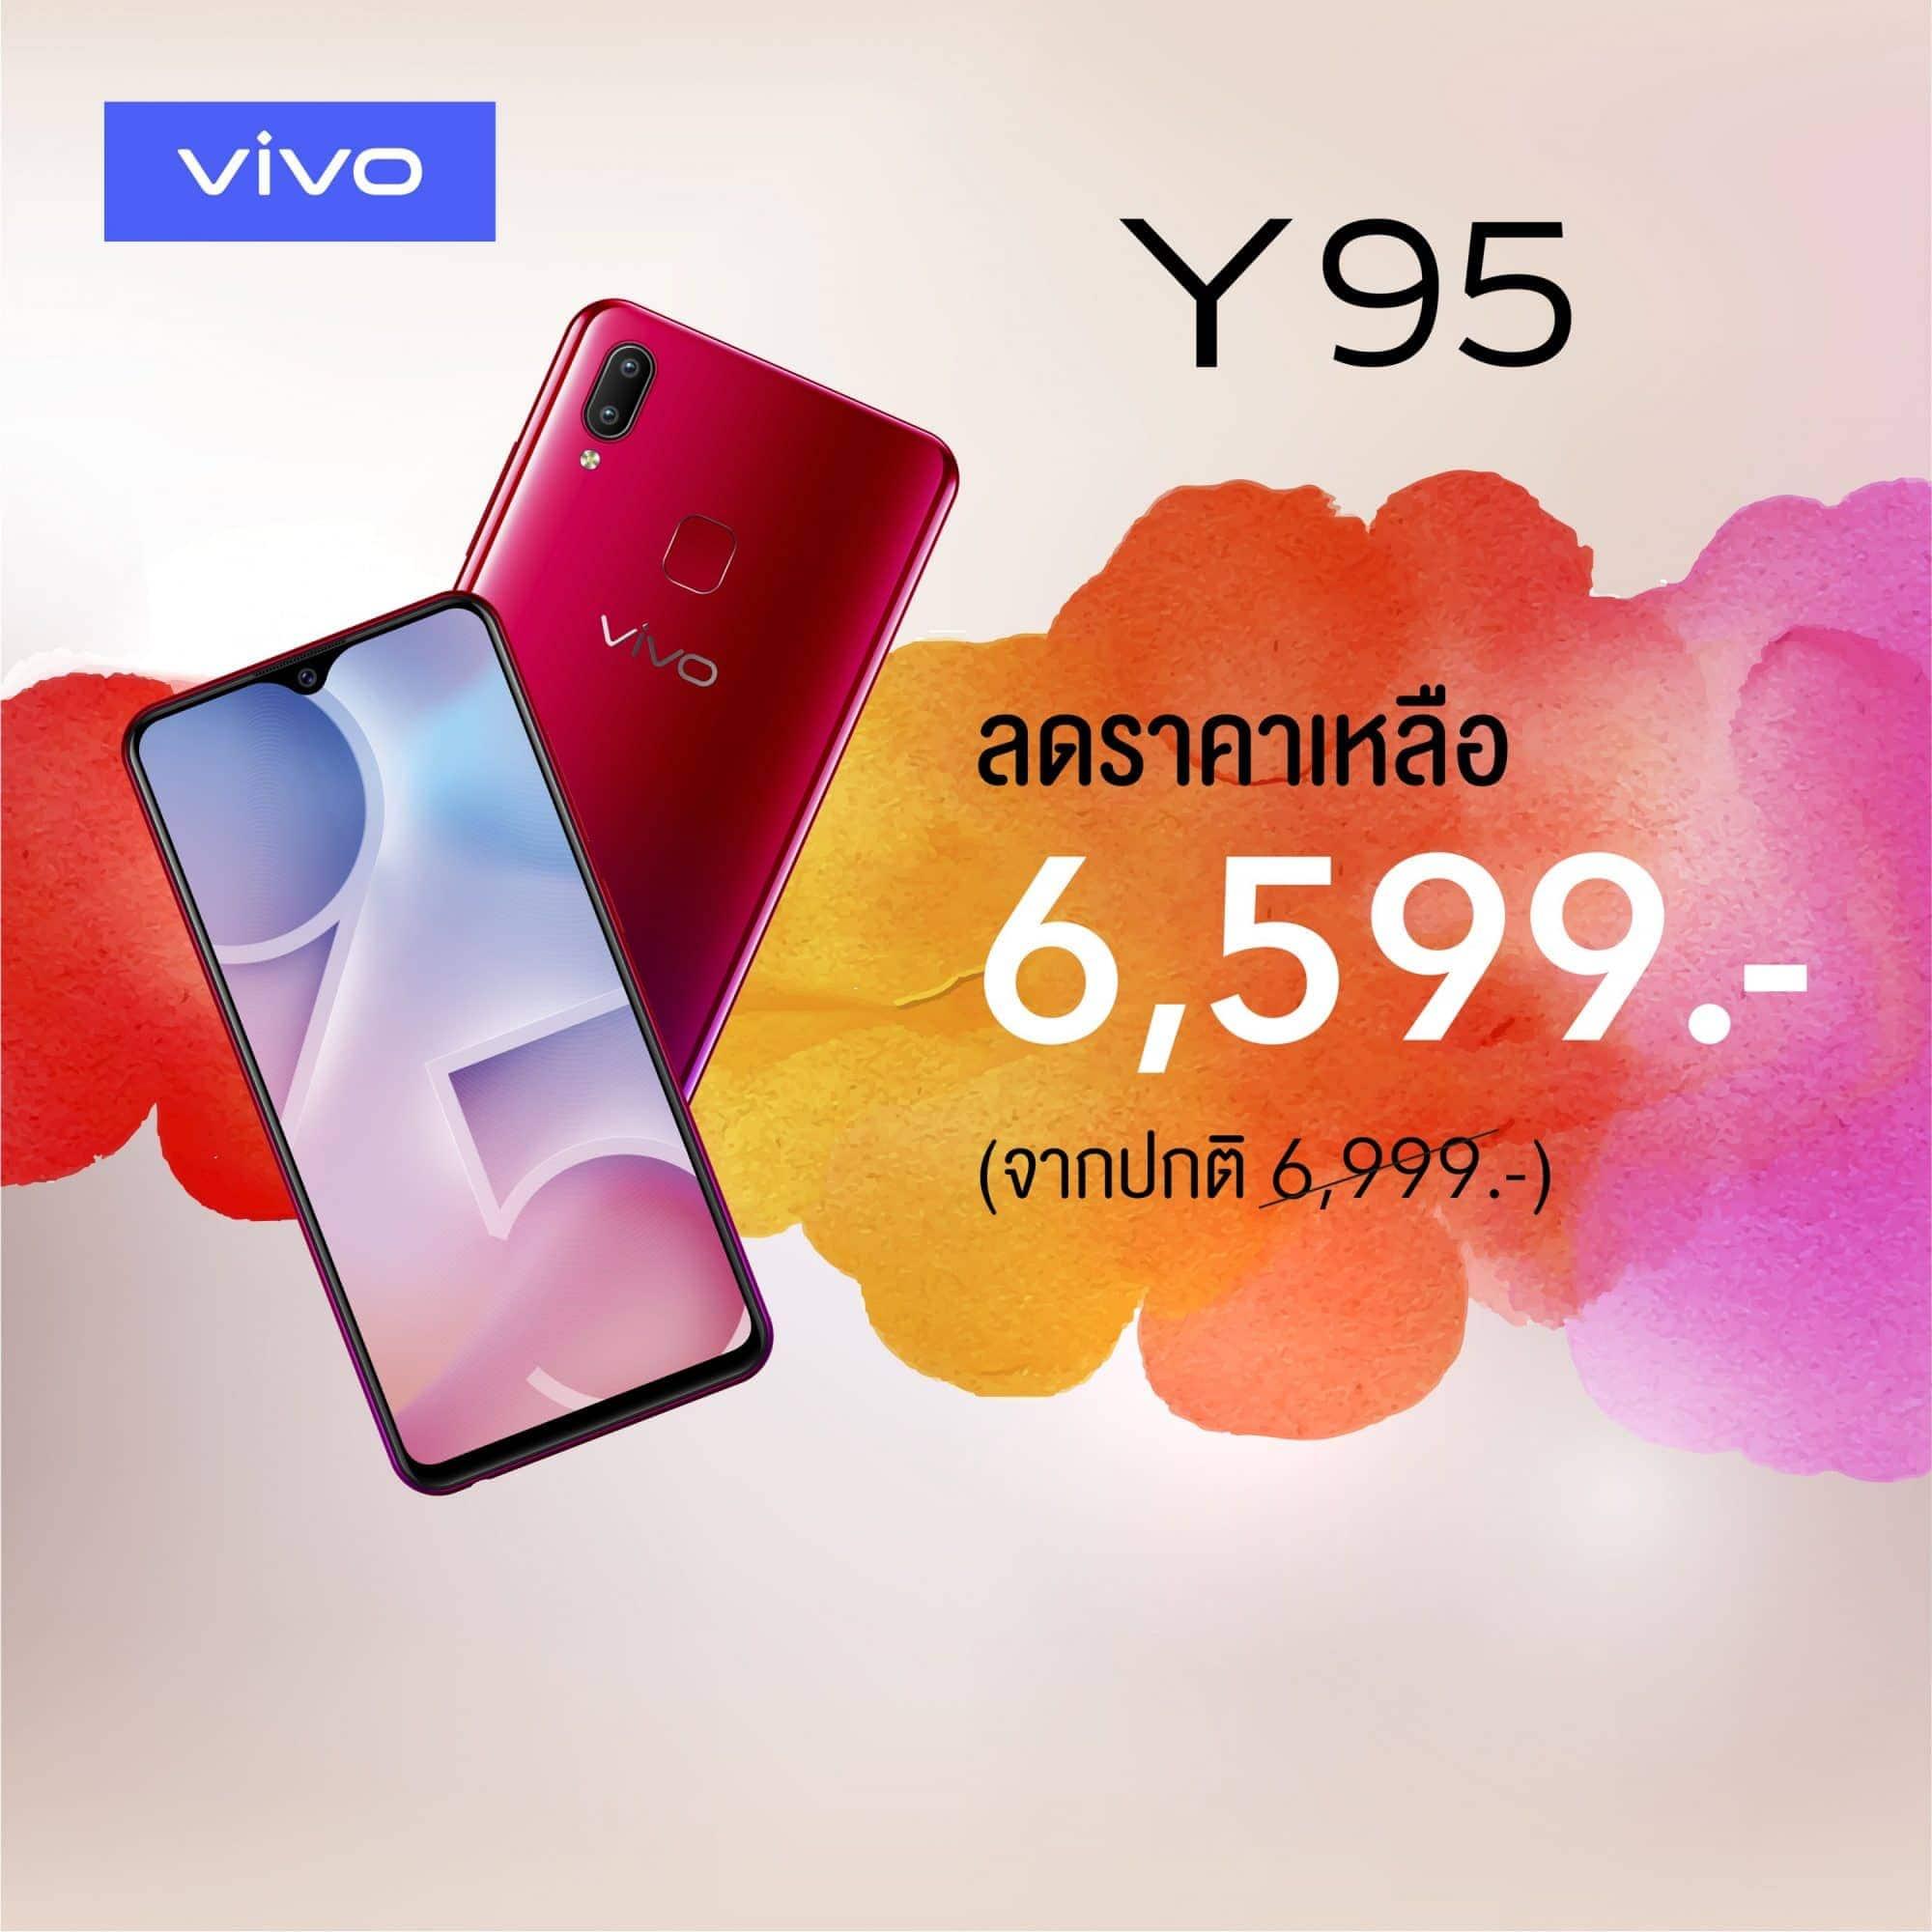 - Summer Sale Promotion 1040x1040 02 - Vivo จัดซัมเมอร์เซลล์ ลดราคาท้าลมร้อน